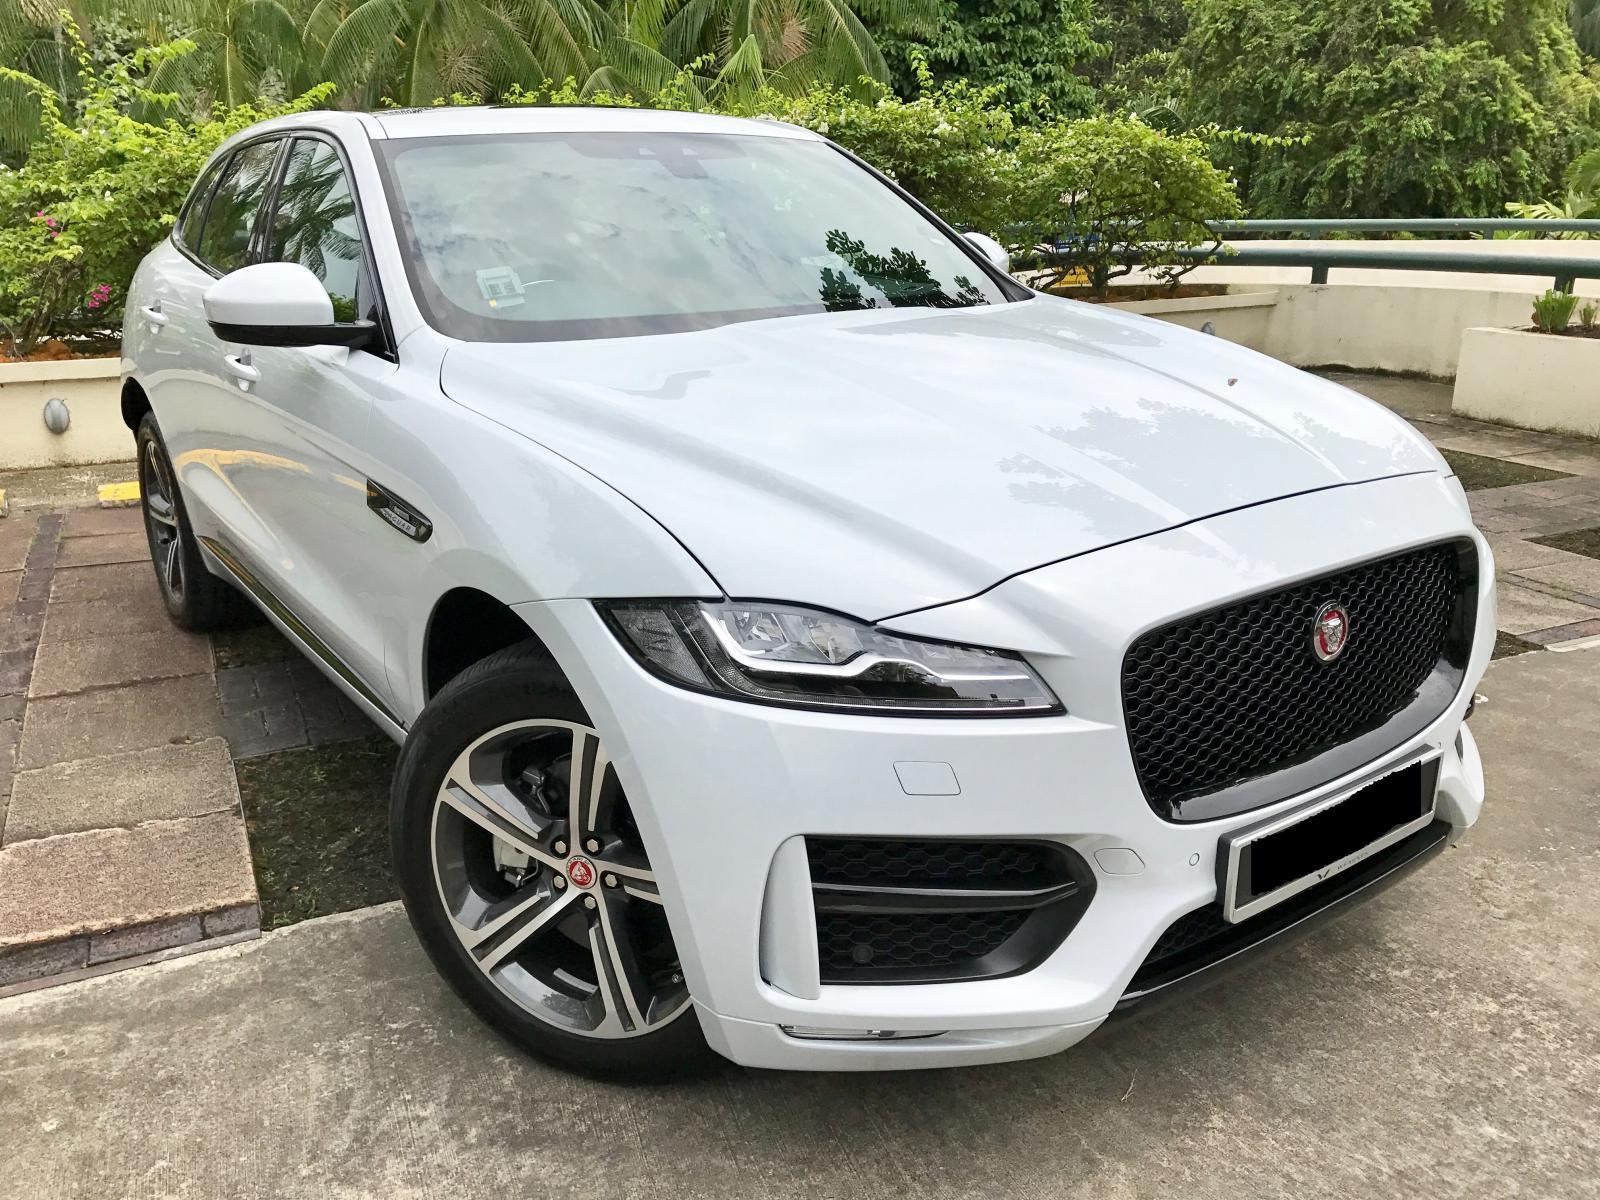 speed nj us jaguar xjs value litre in forum getrag